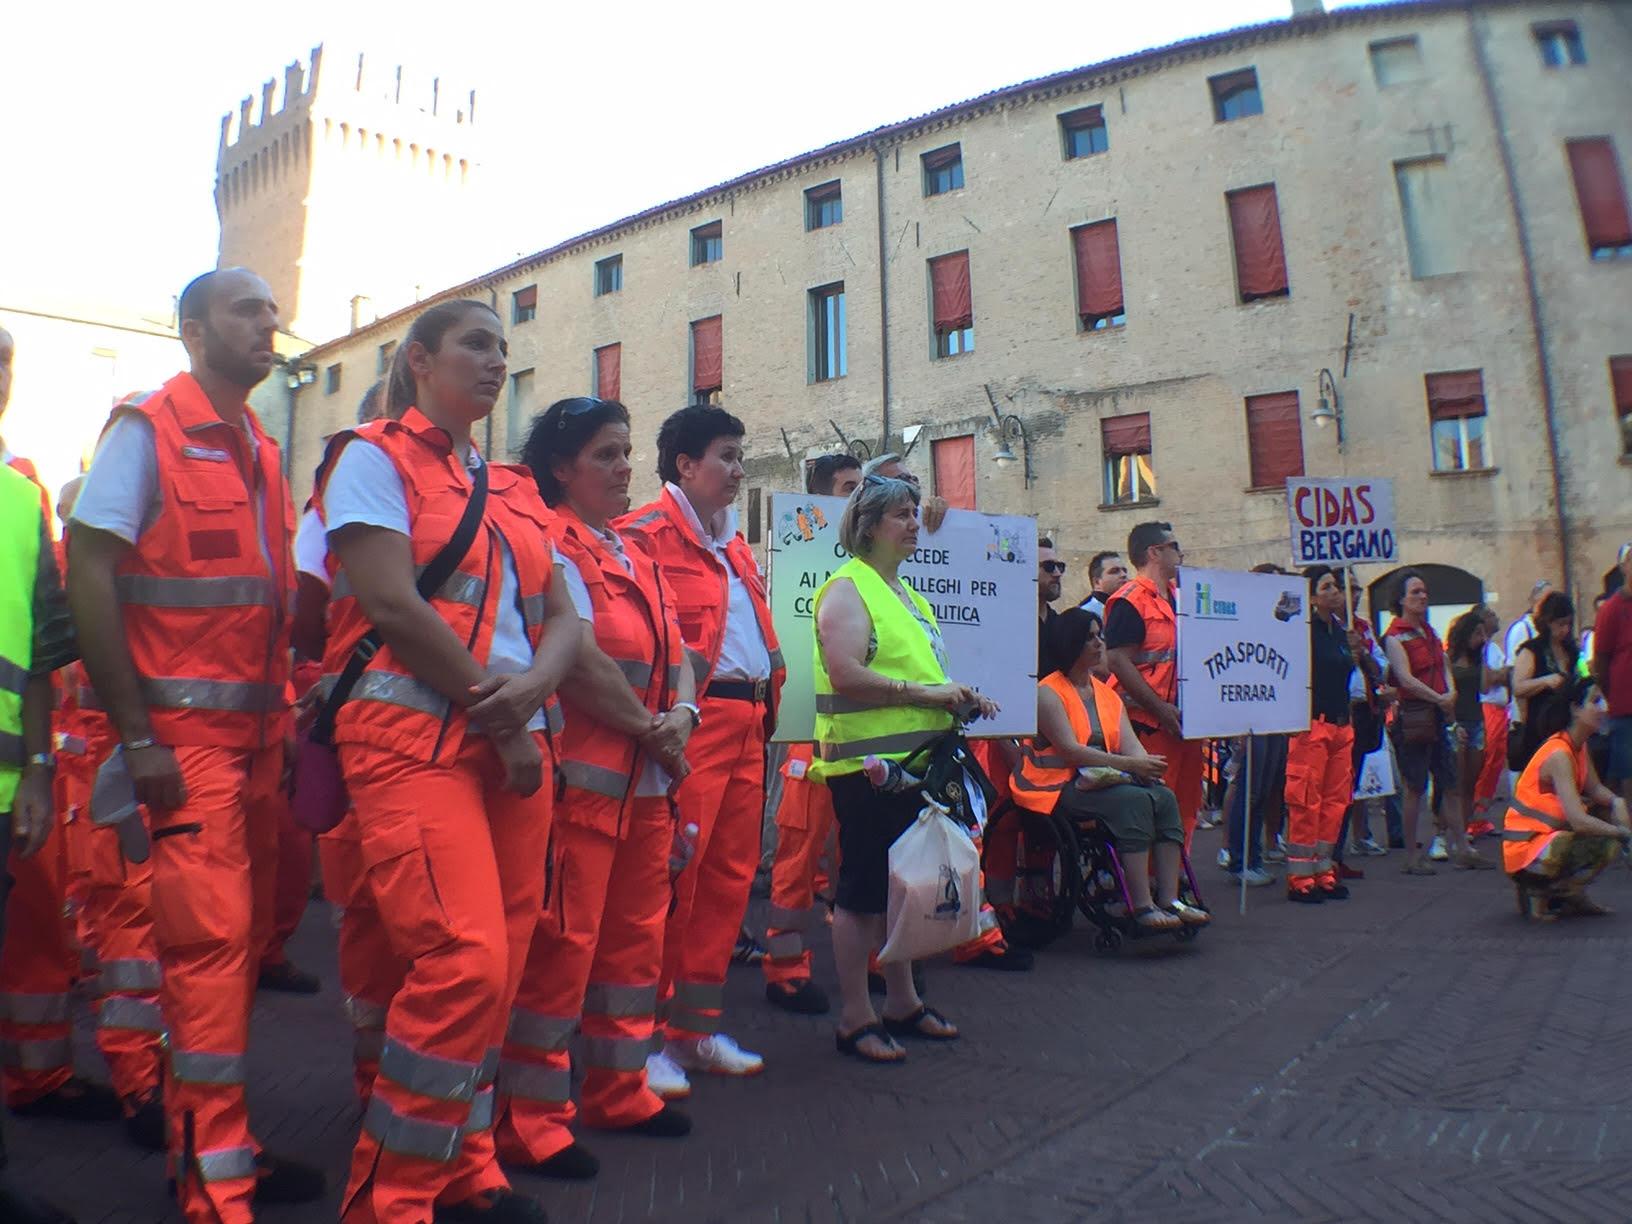 Ferrara, CIDAS in piazza a difesa dei posti di lavoro nell'emergenza | Emergency Live 4